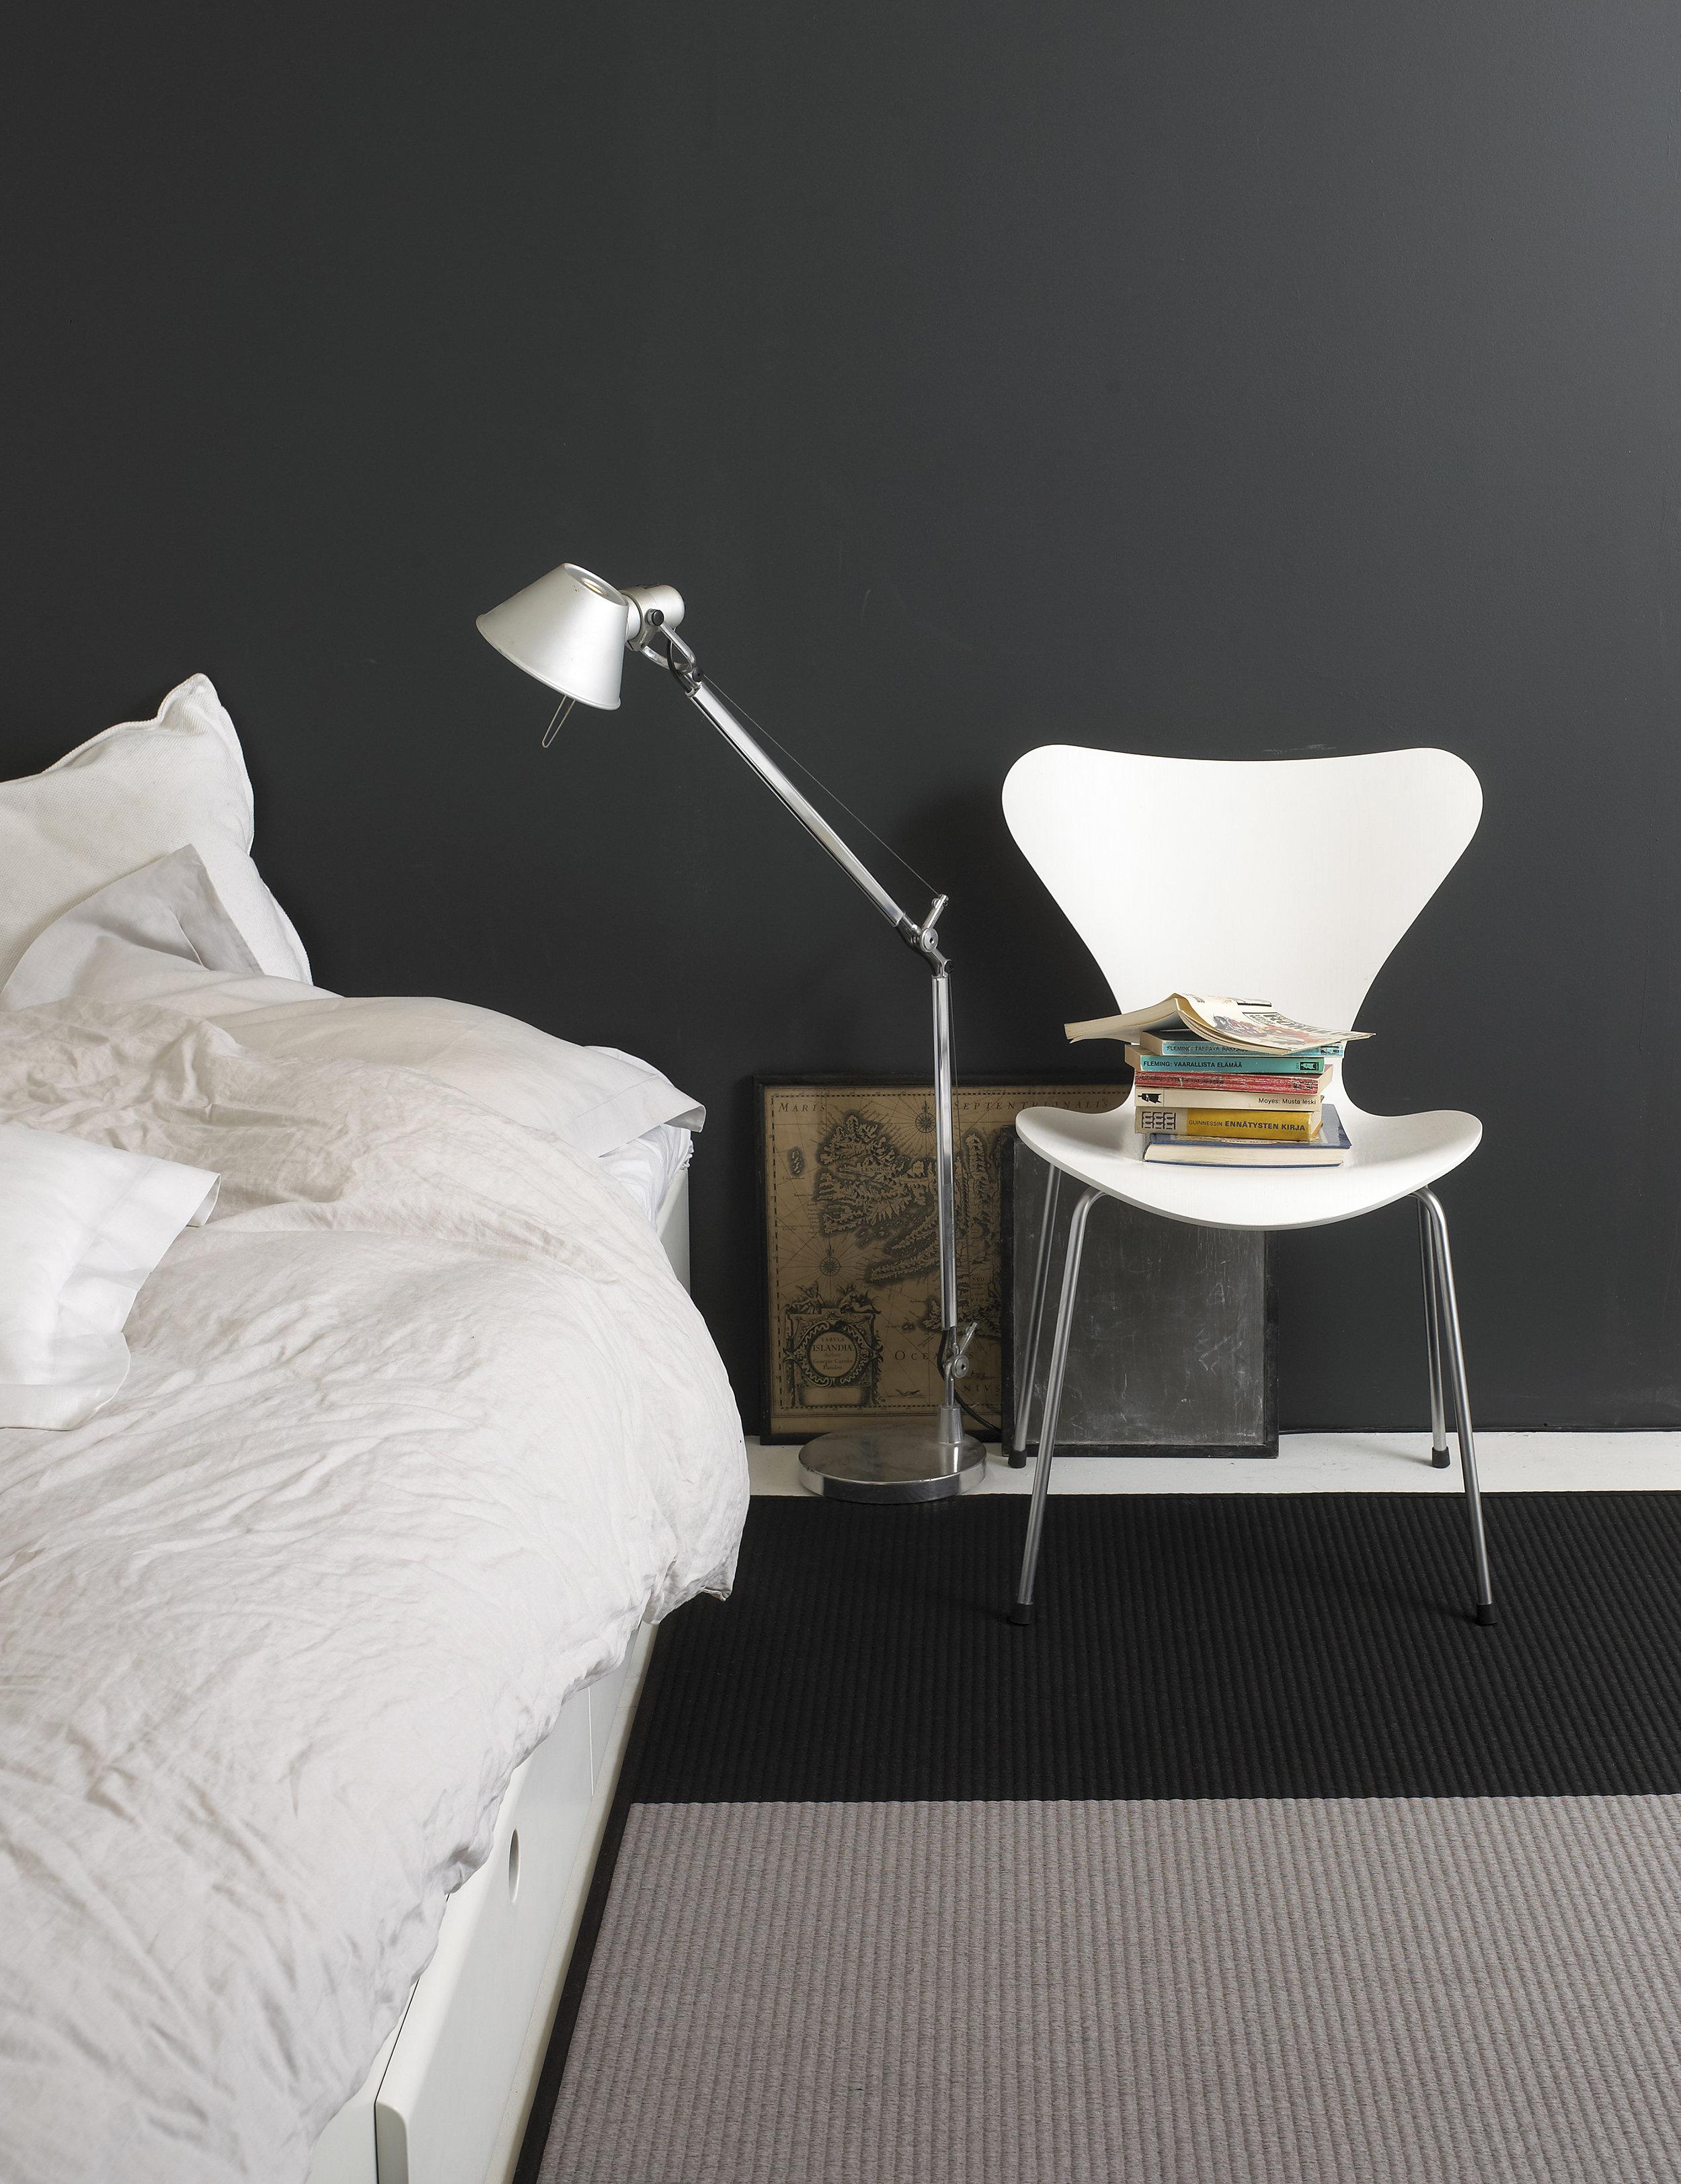 Beach paper yarn carpet personalized colors grey-black